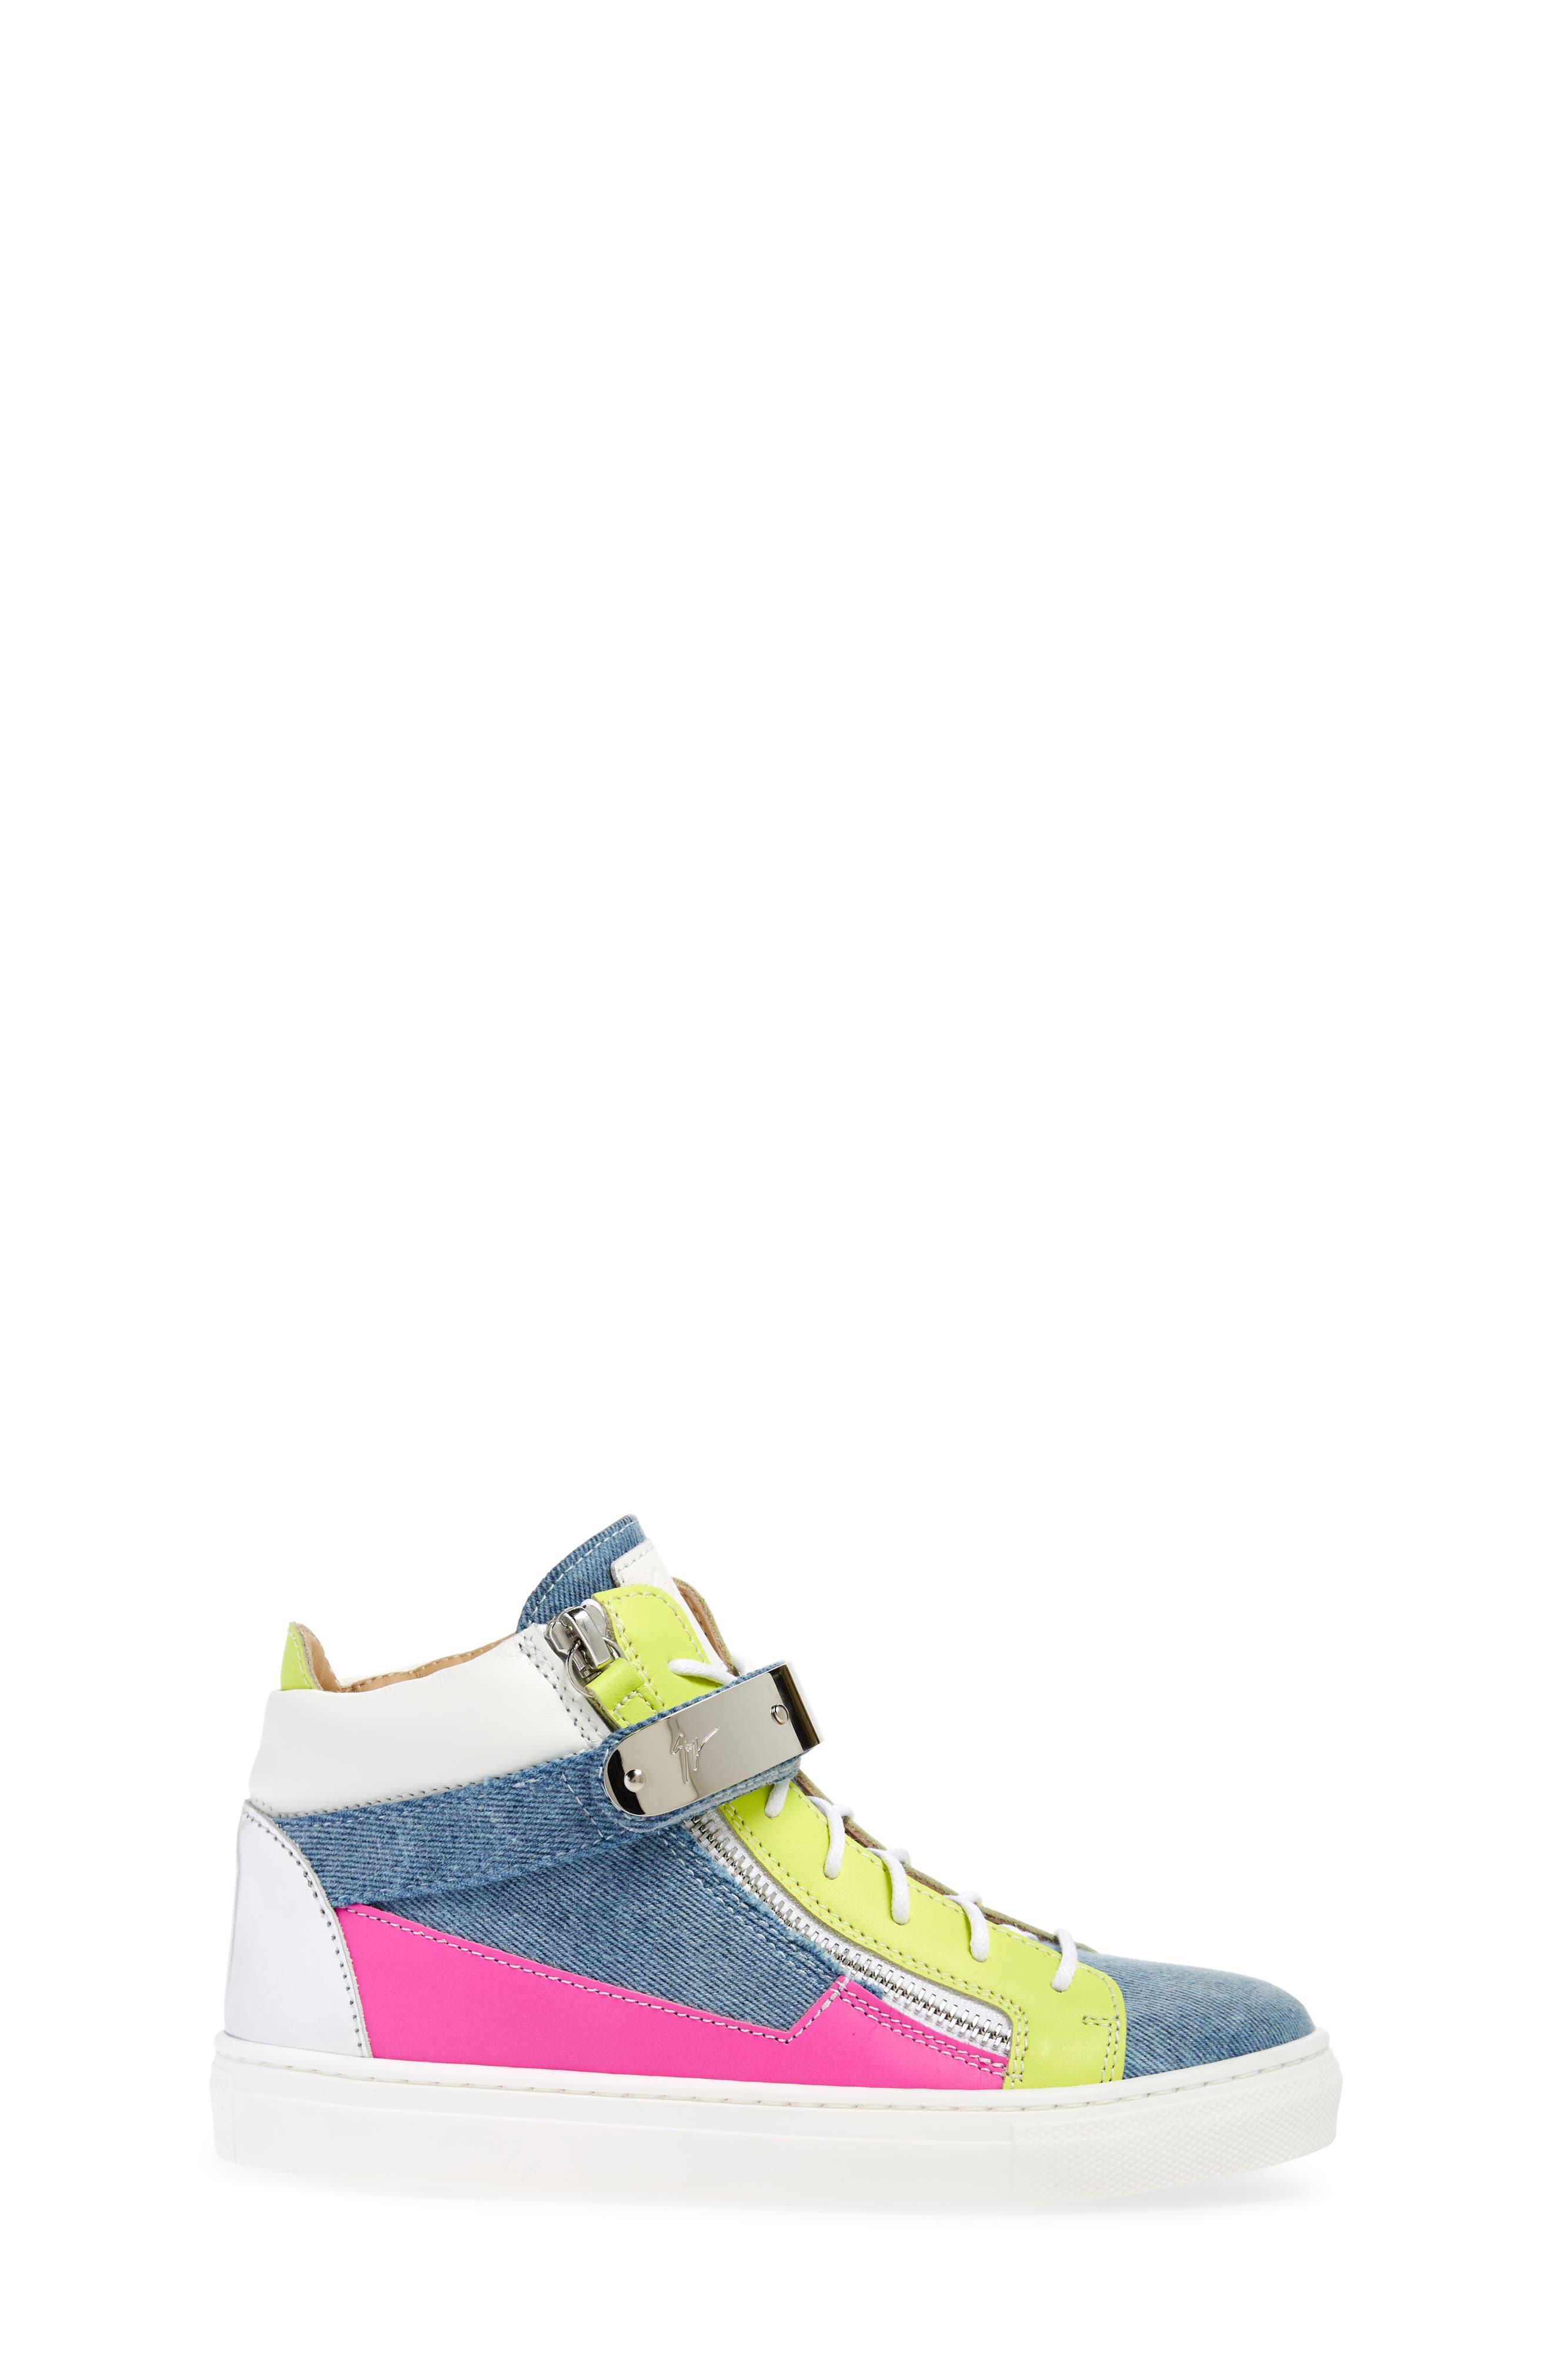 London High Top Sneaker,                             Alternate thumbnail 3, color,                             400